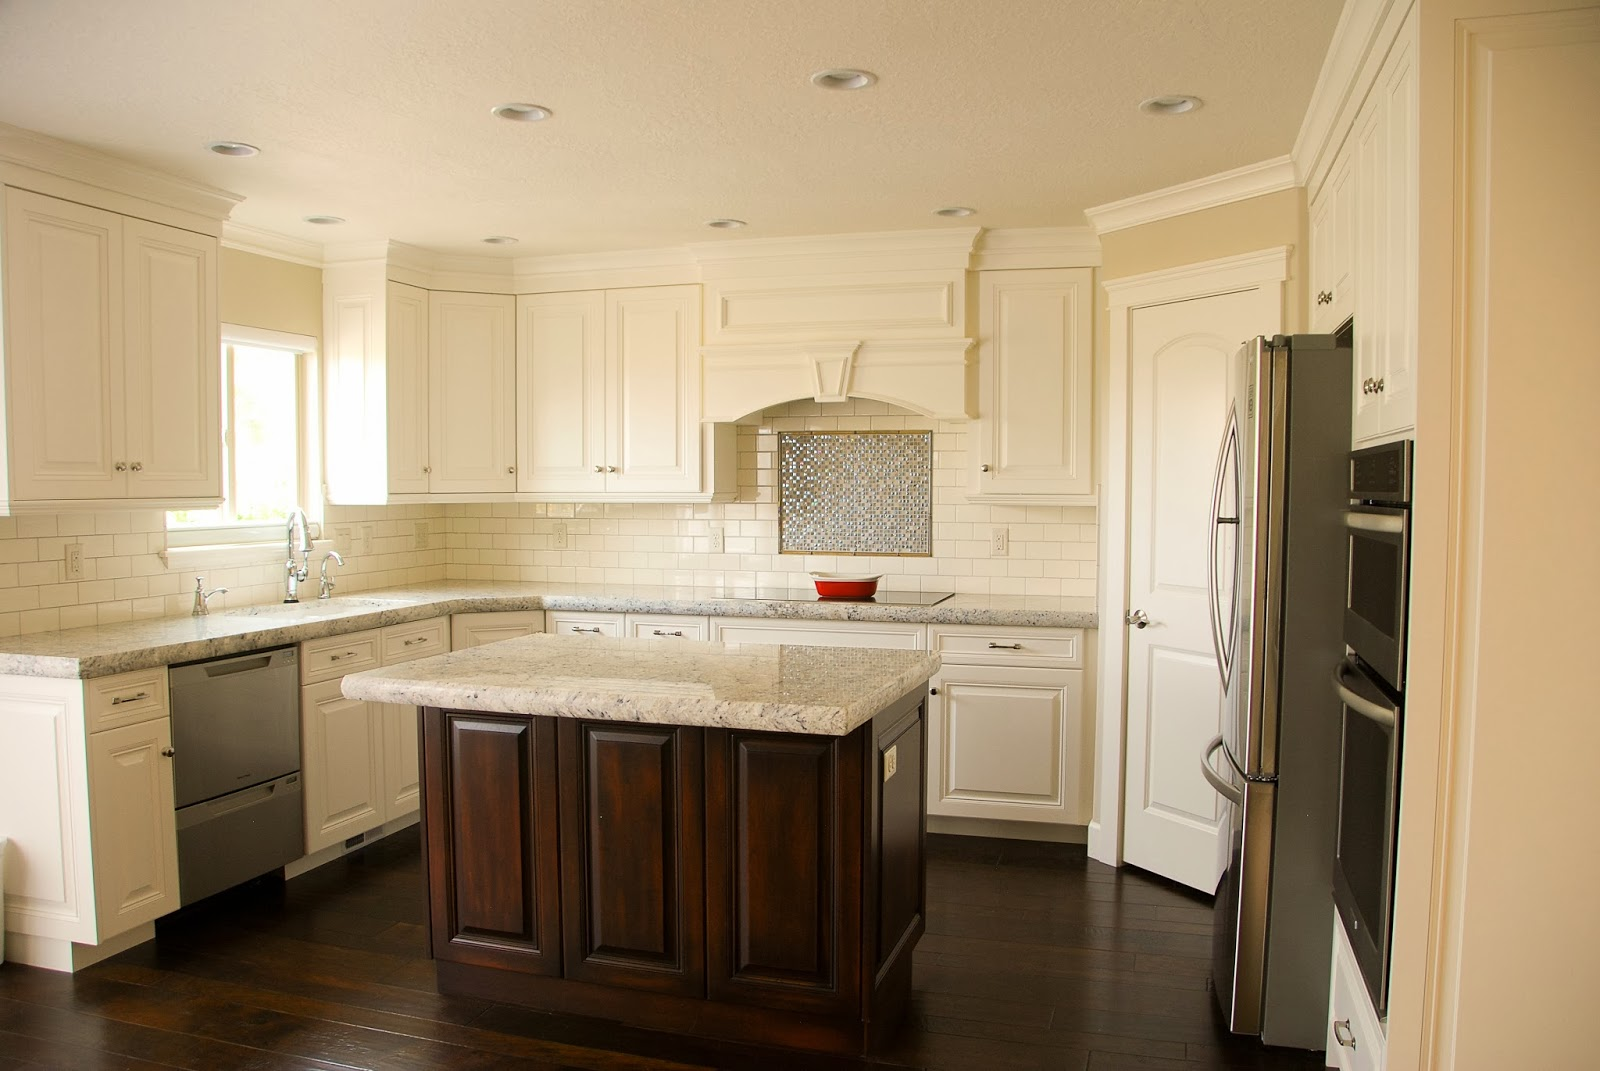 Bianco Romano Granite Kitchen The Granite Gurus Bianco Romano Granite Kitchen From Mgs By Design